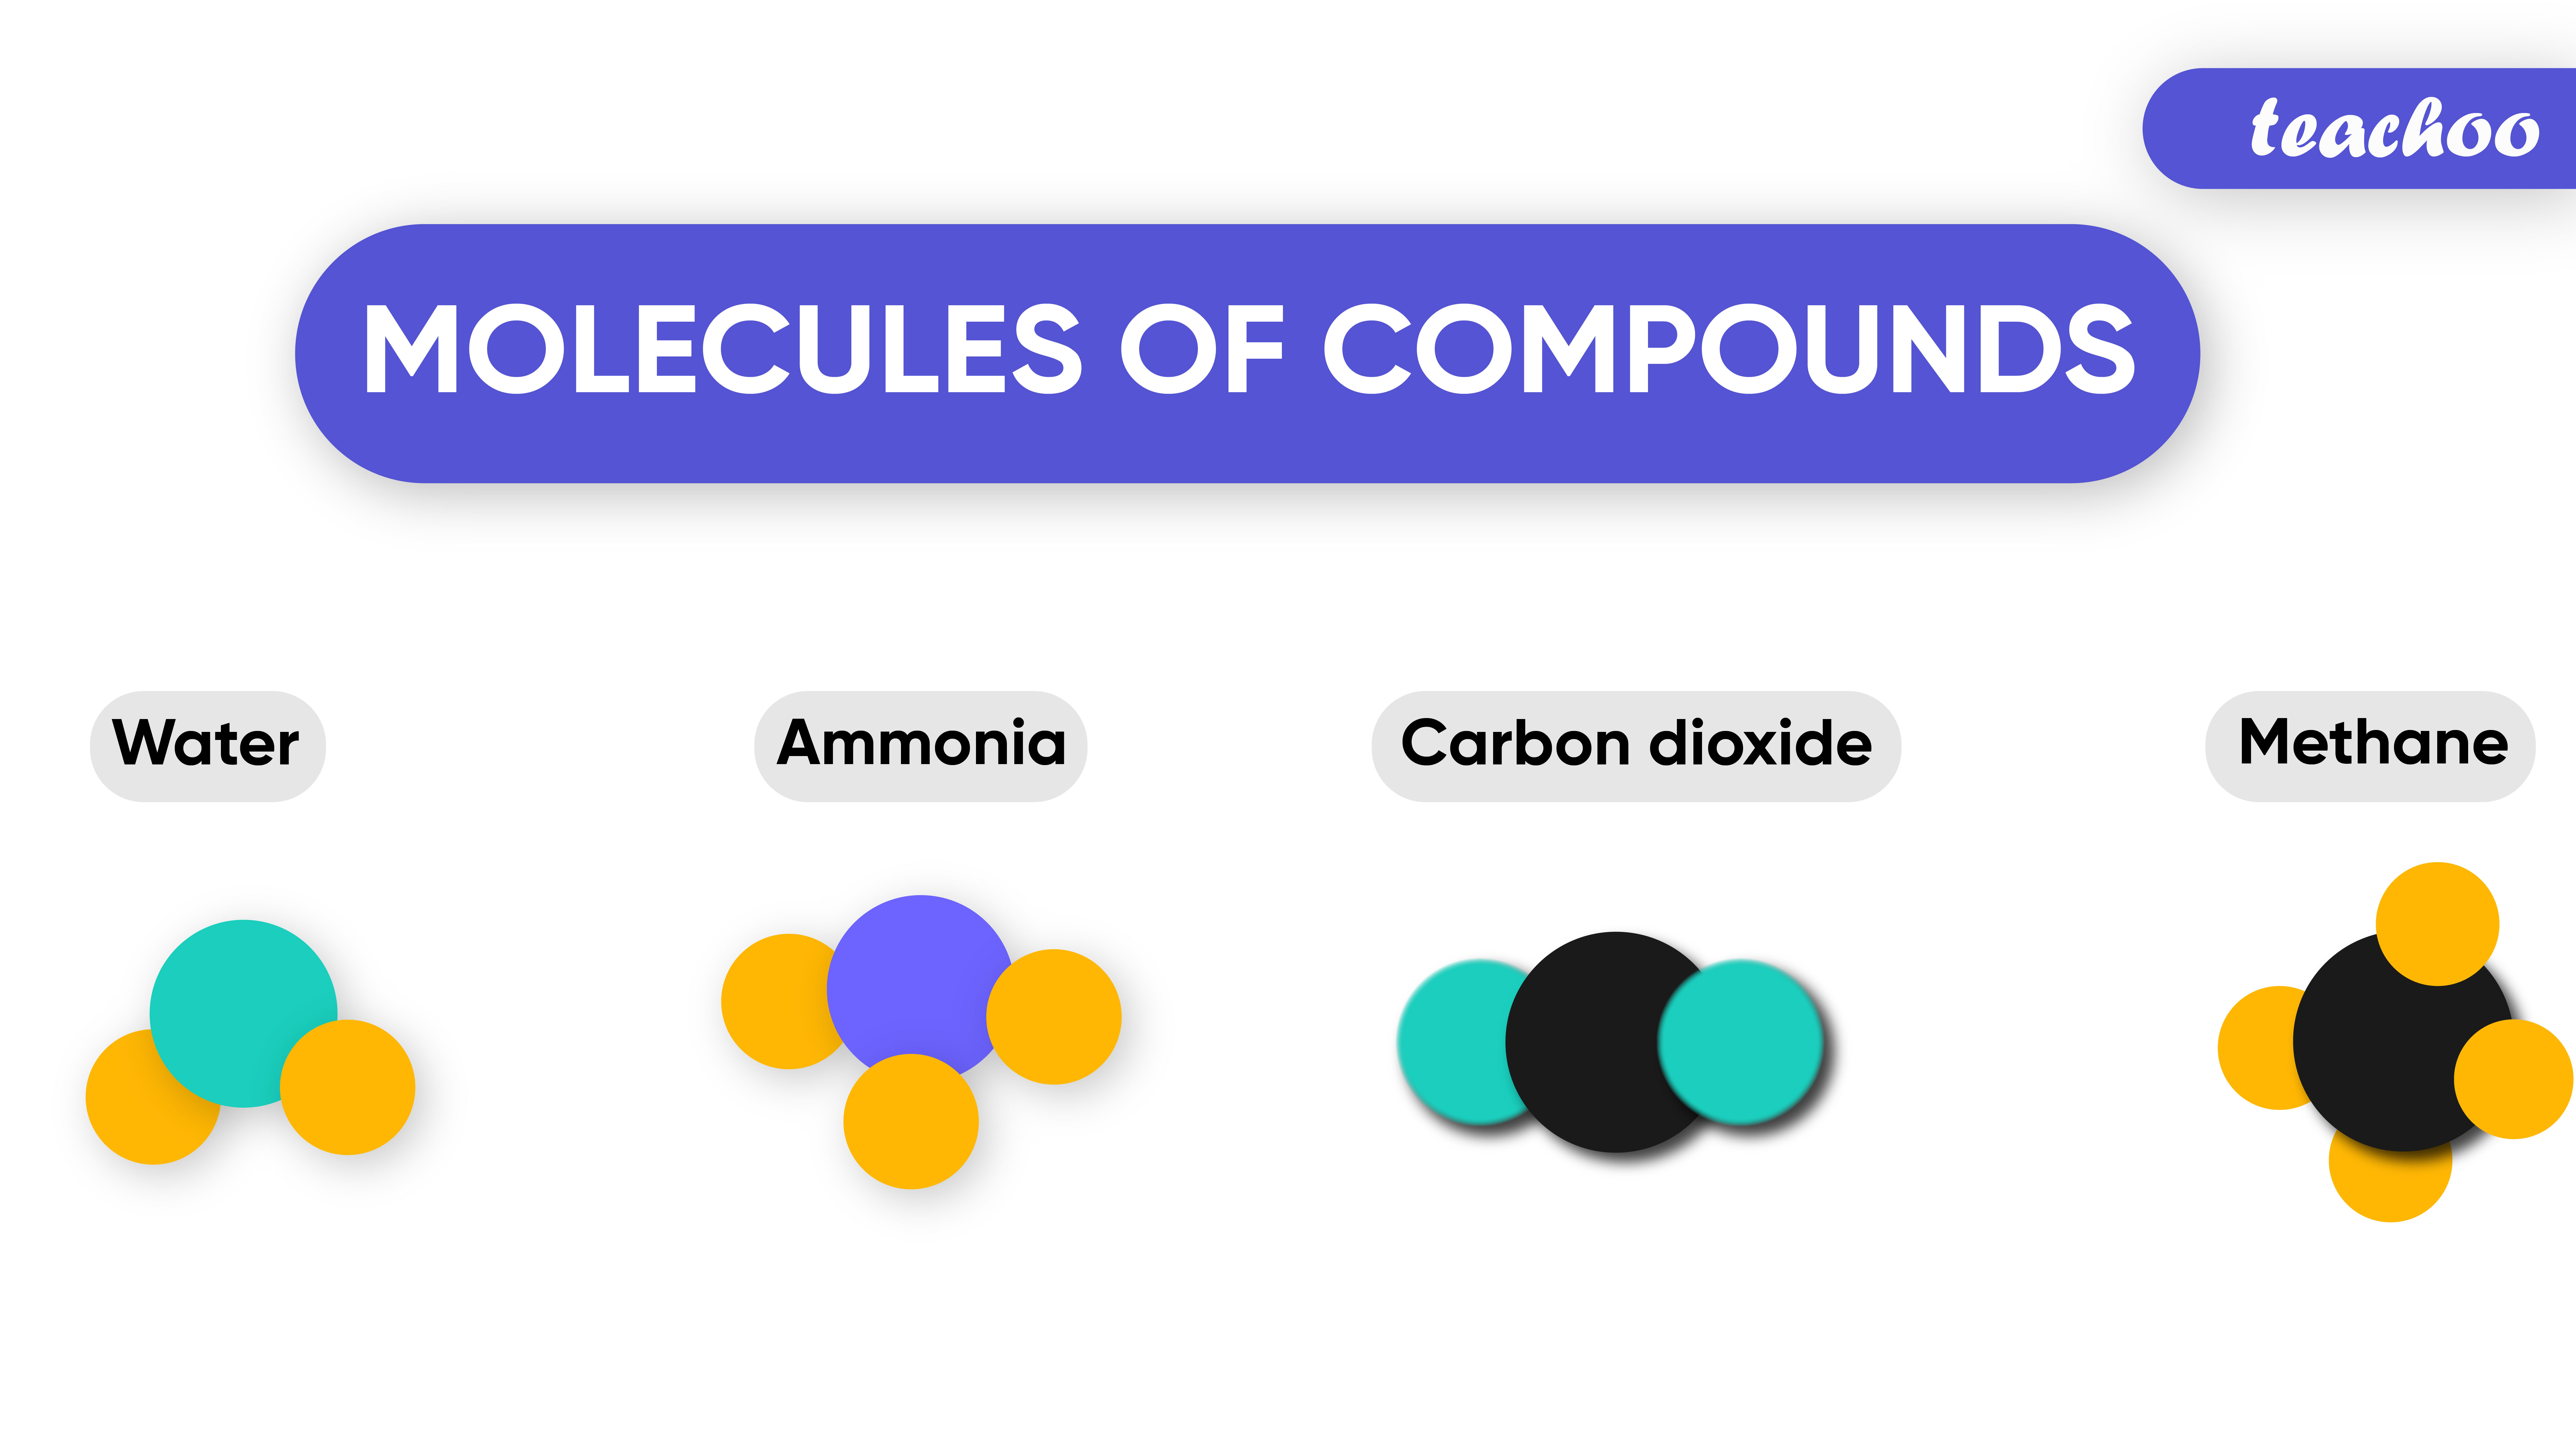 Molecules of Compounds-fullWidth-01.jpg